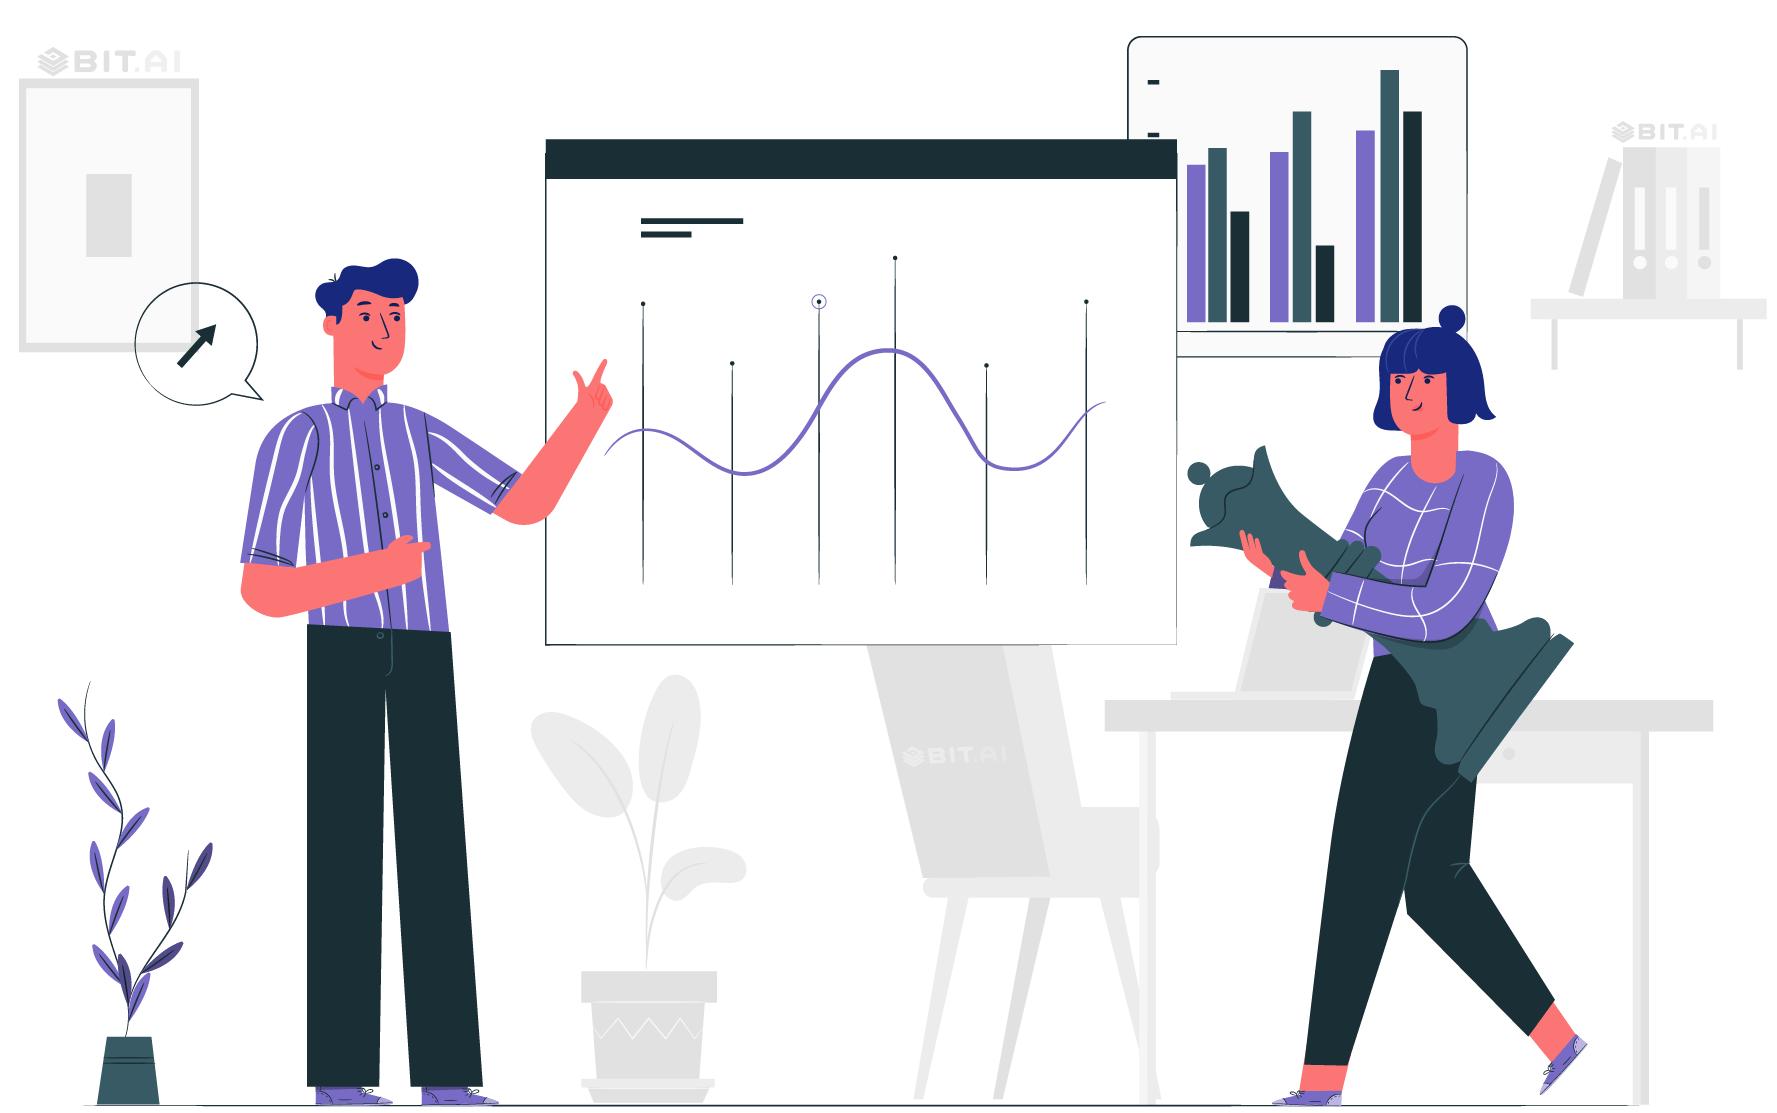 Analytics report of competitor's statistics